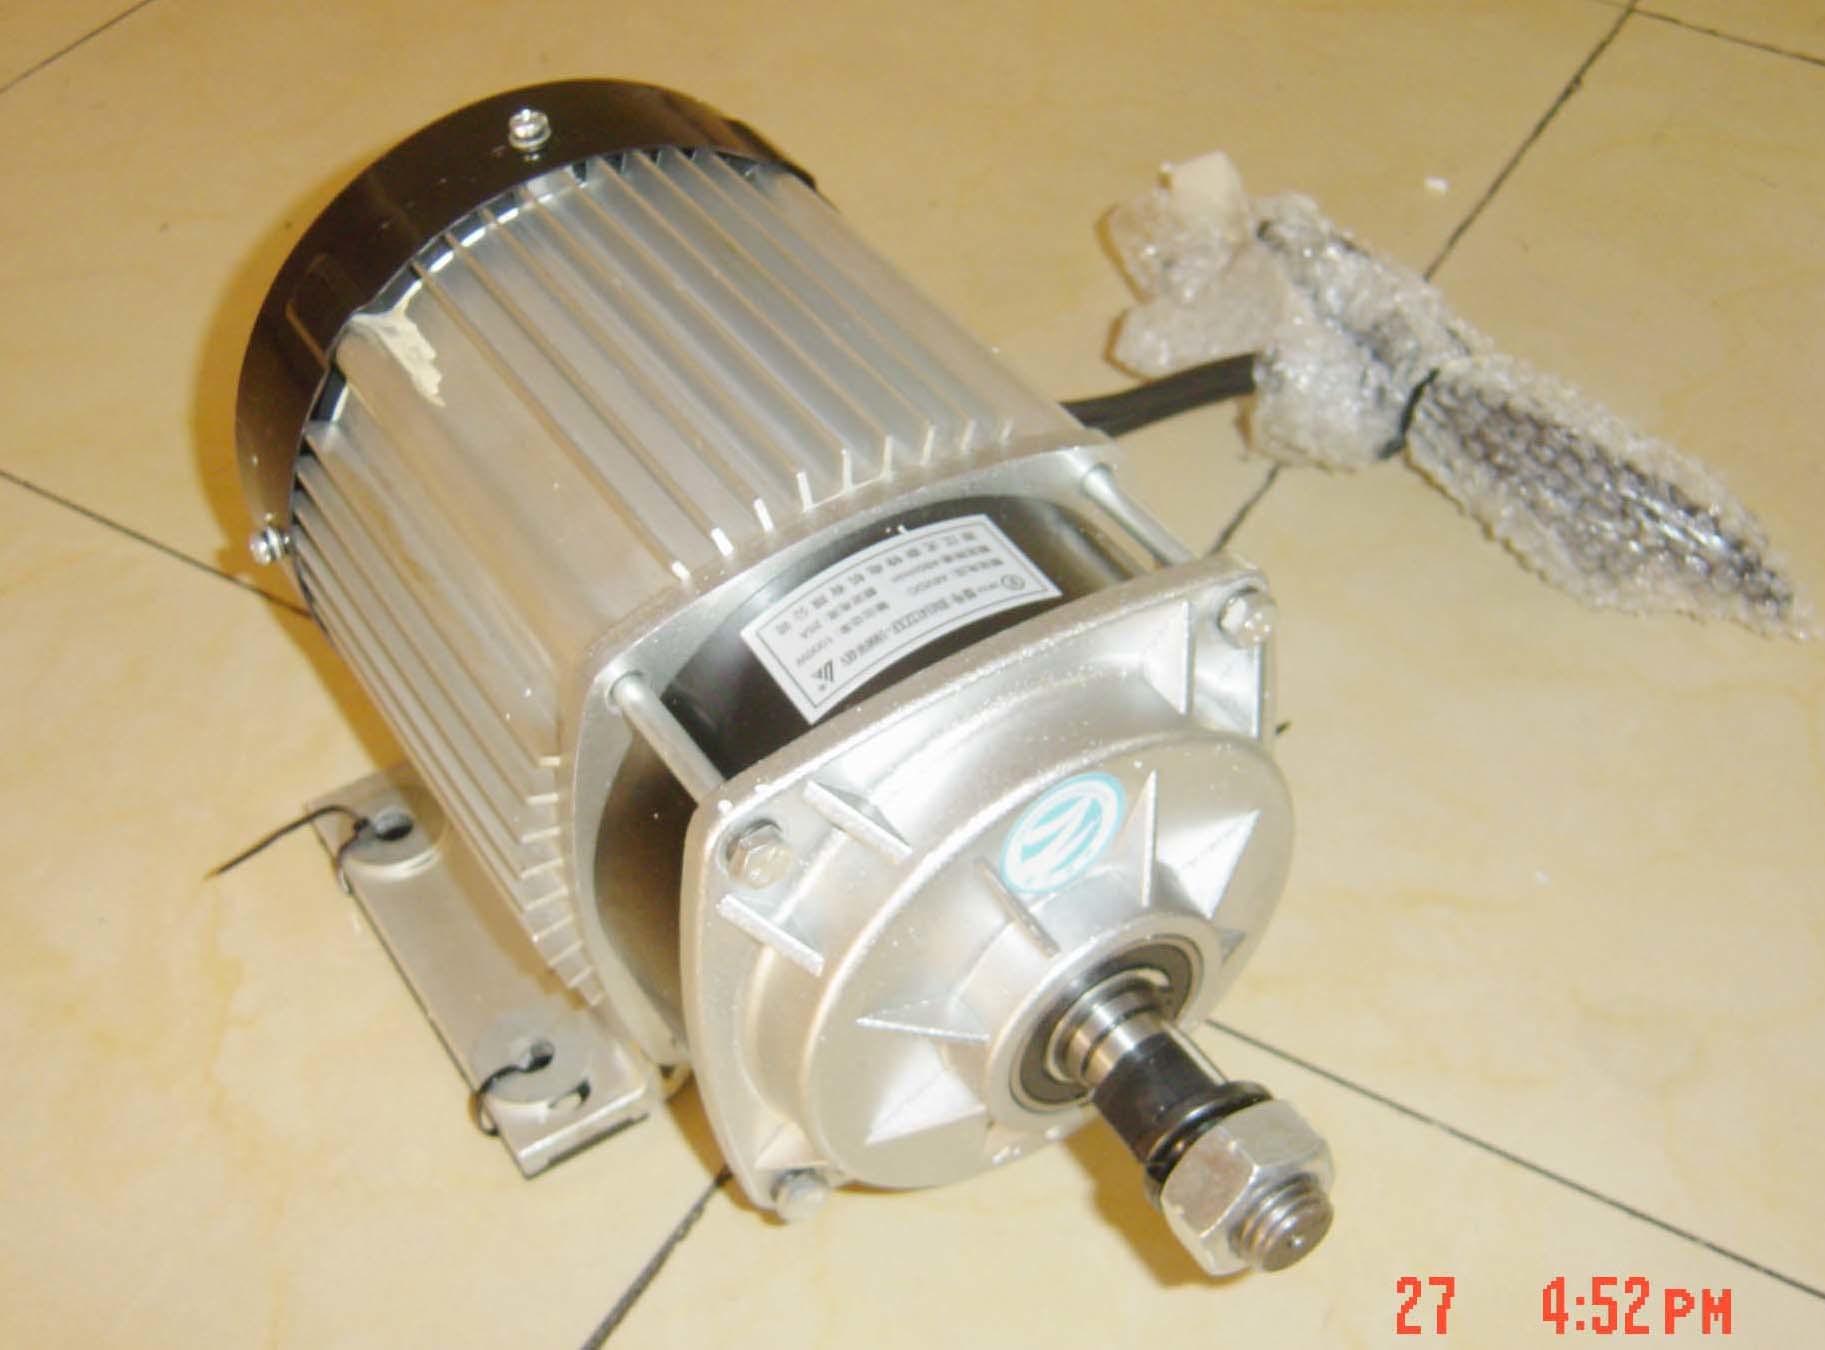 Triciclo motor bm1412zxf triciclo motor bm1412zxf for Unite motor co ltd